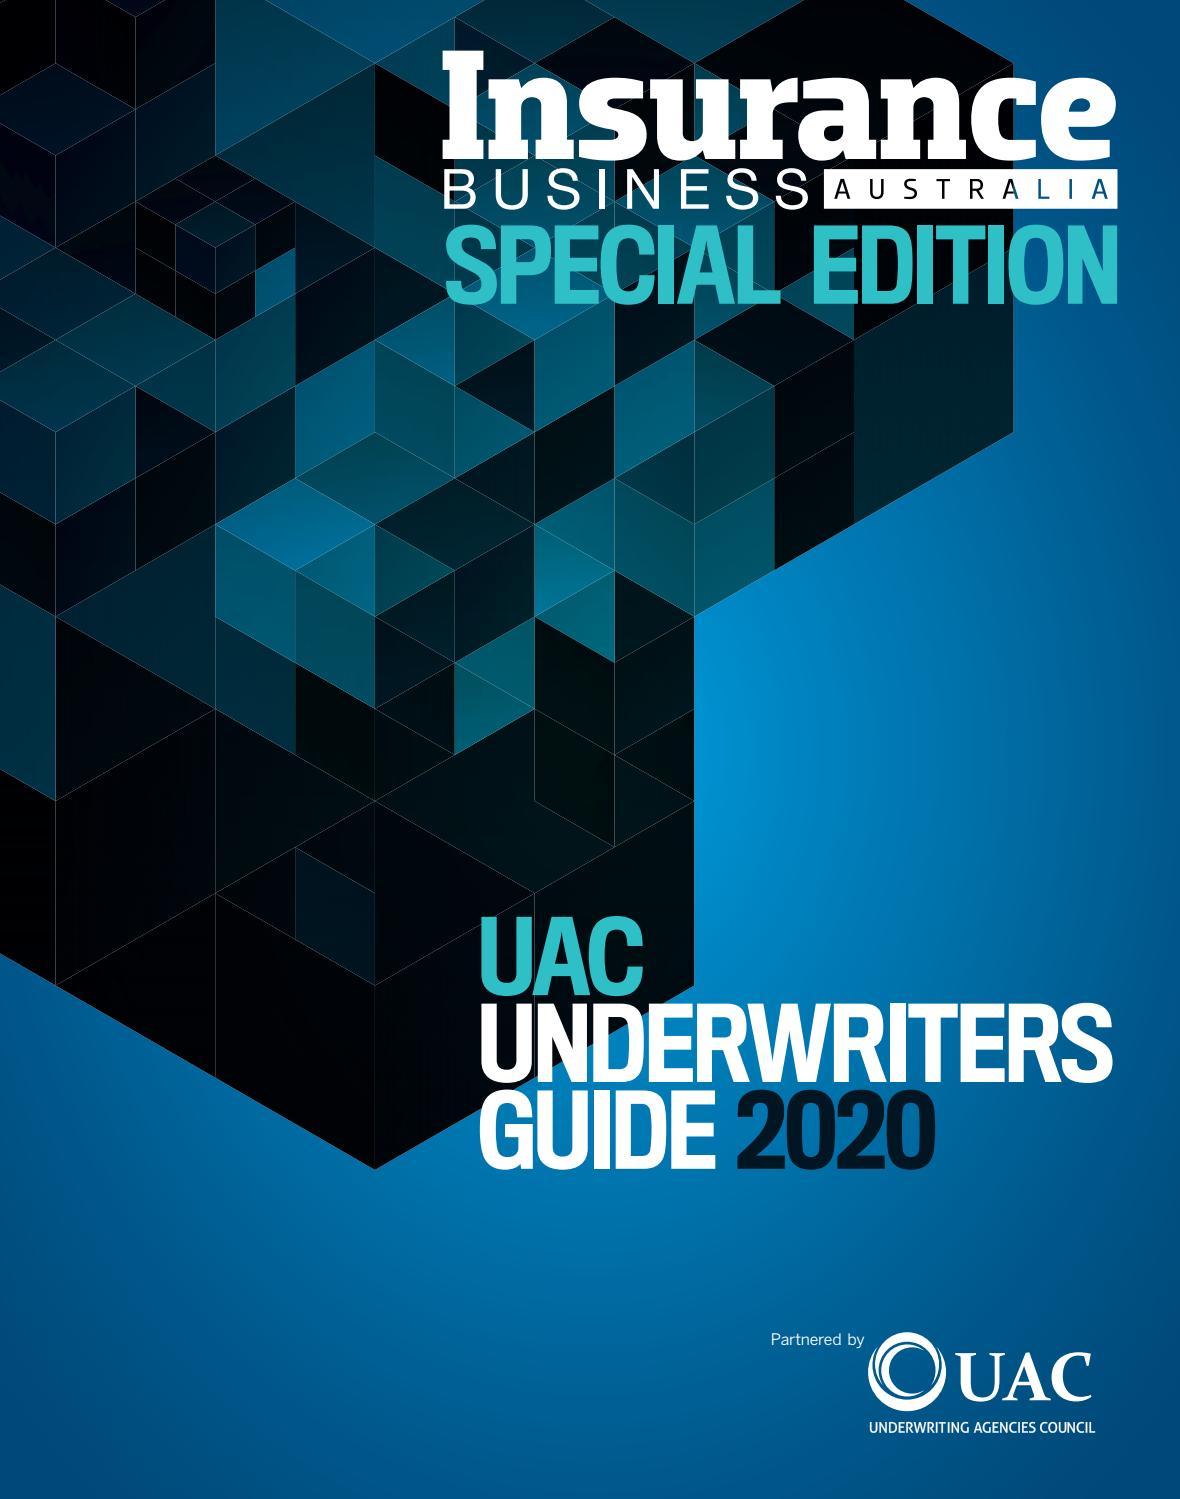 Insurance Business Uac Underwriters Guide 2020 By Key Media Issuu